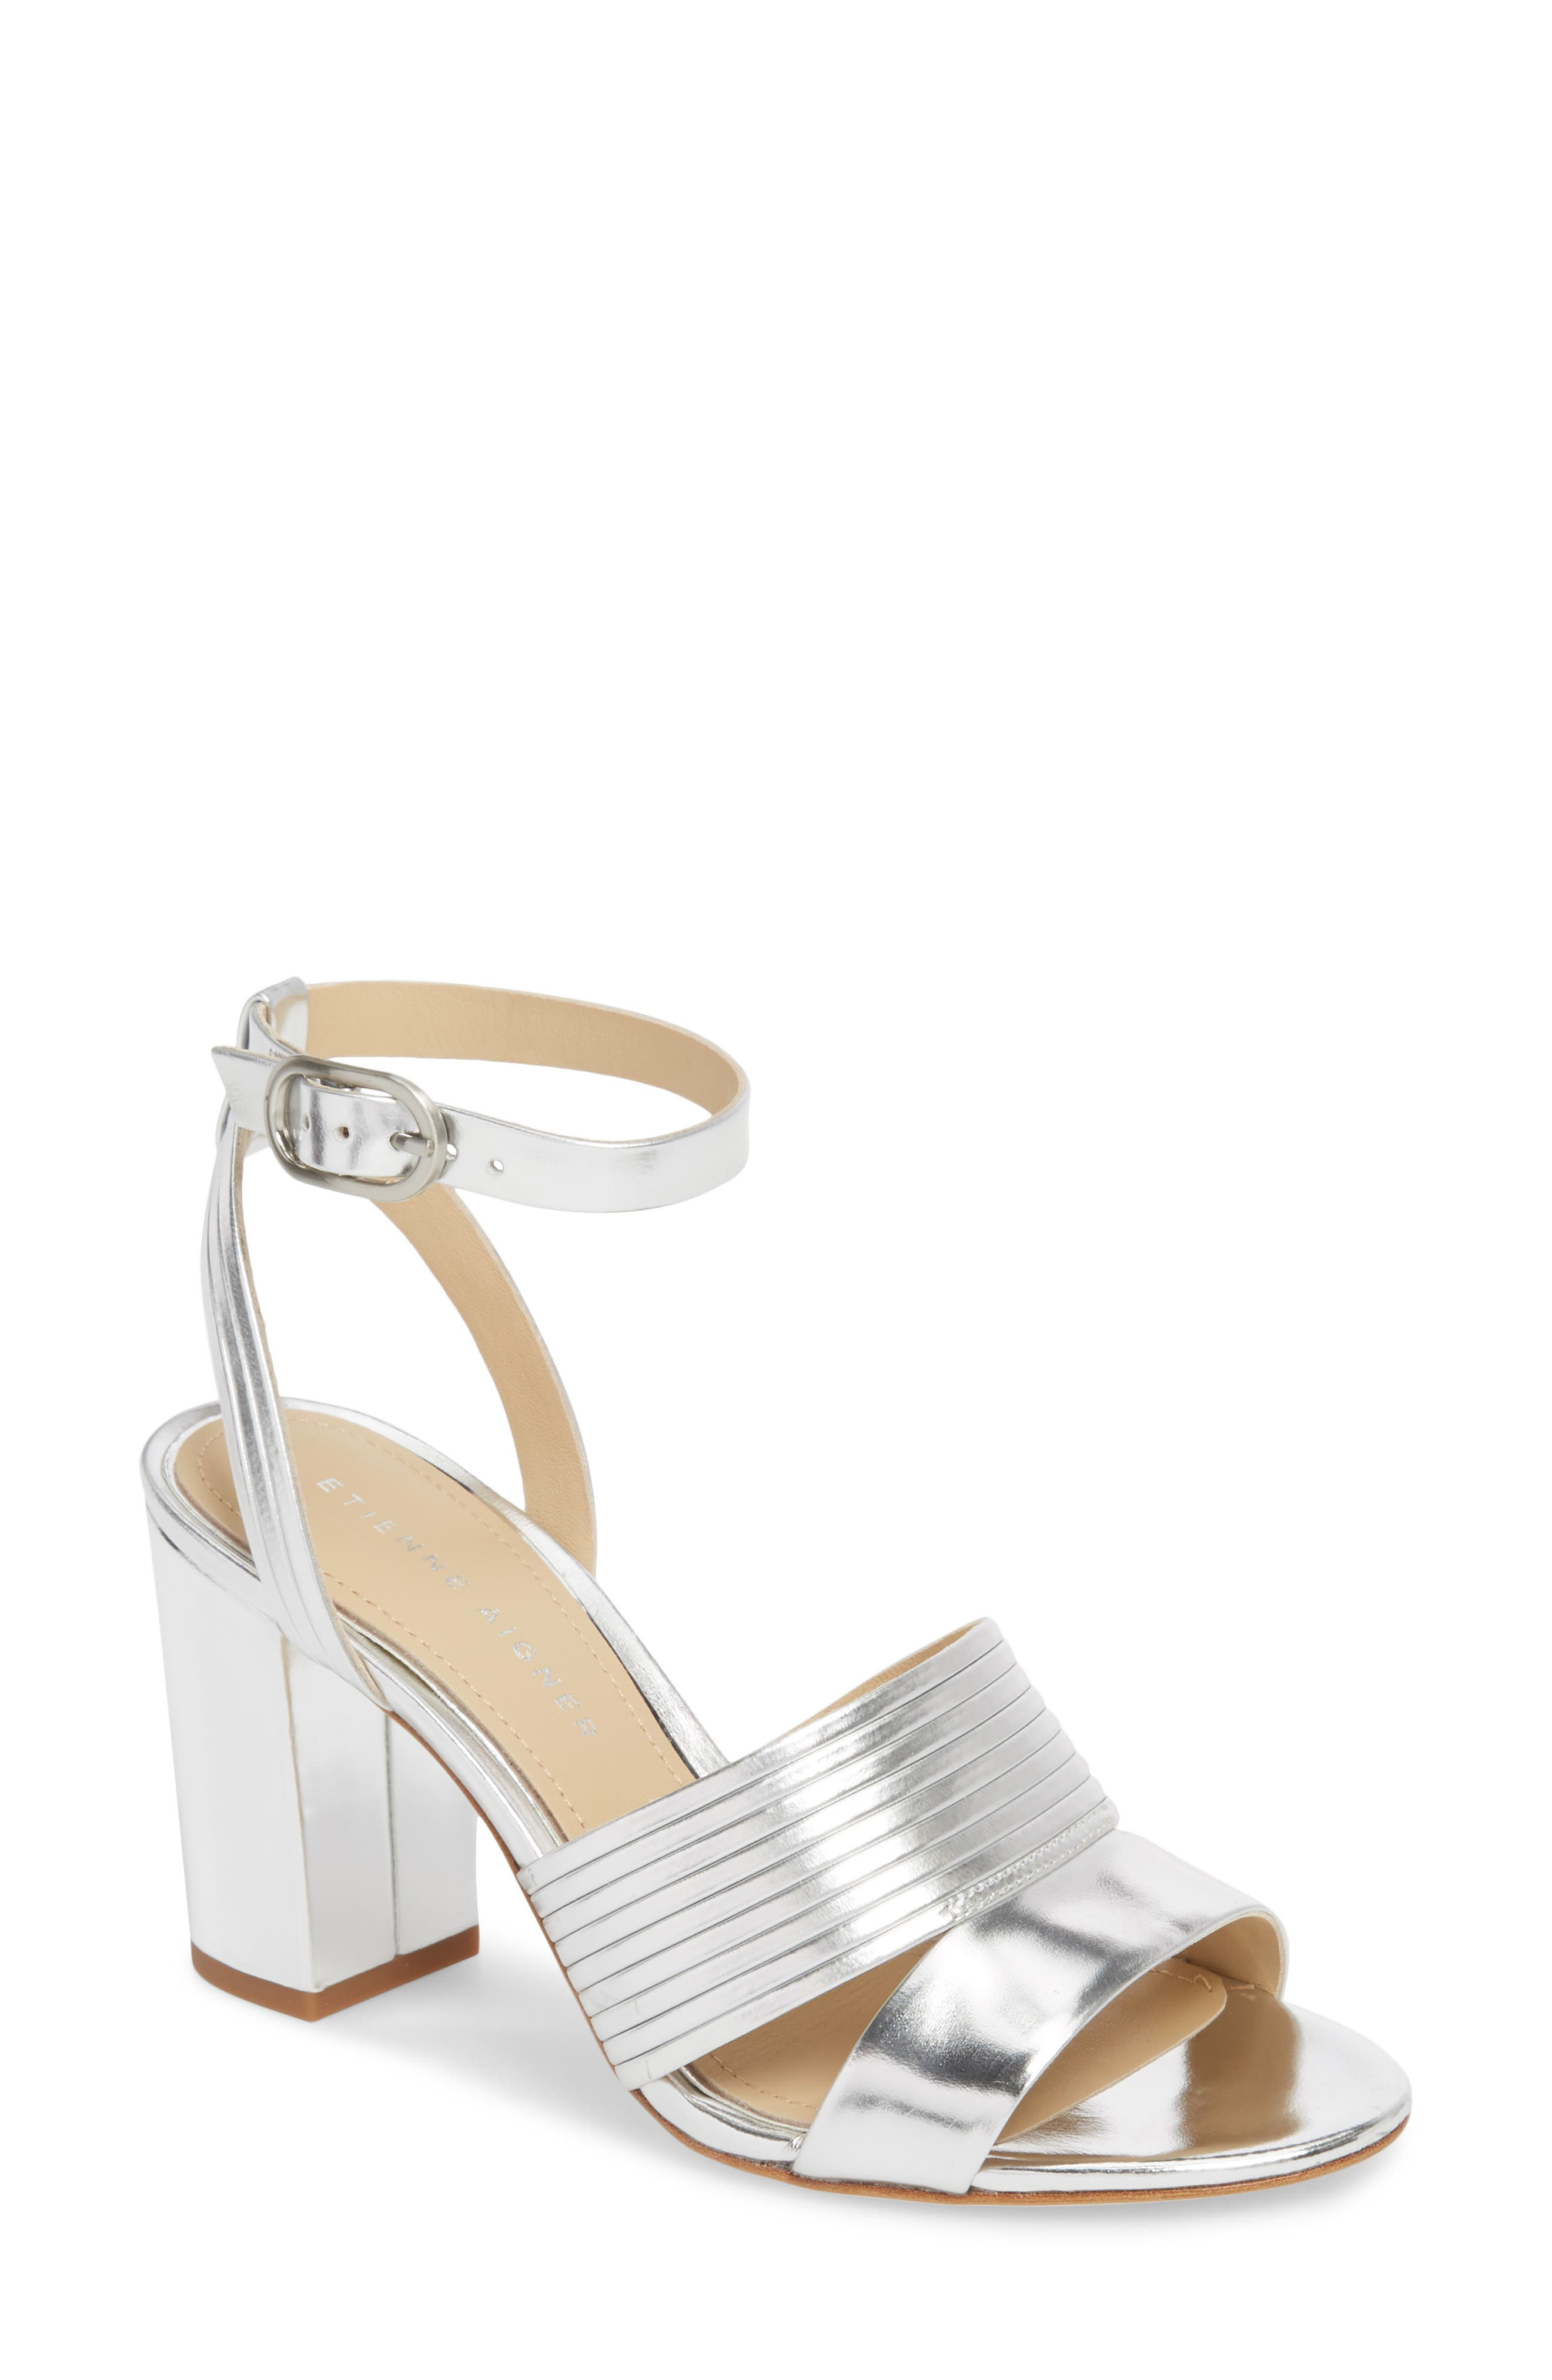 ETIENNE AIGNER Layla Ankle Strap Sandal, Main, color, 040